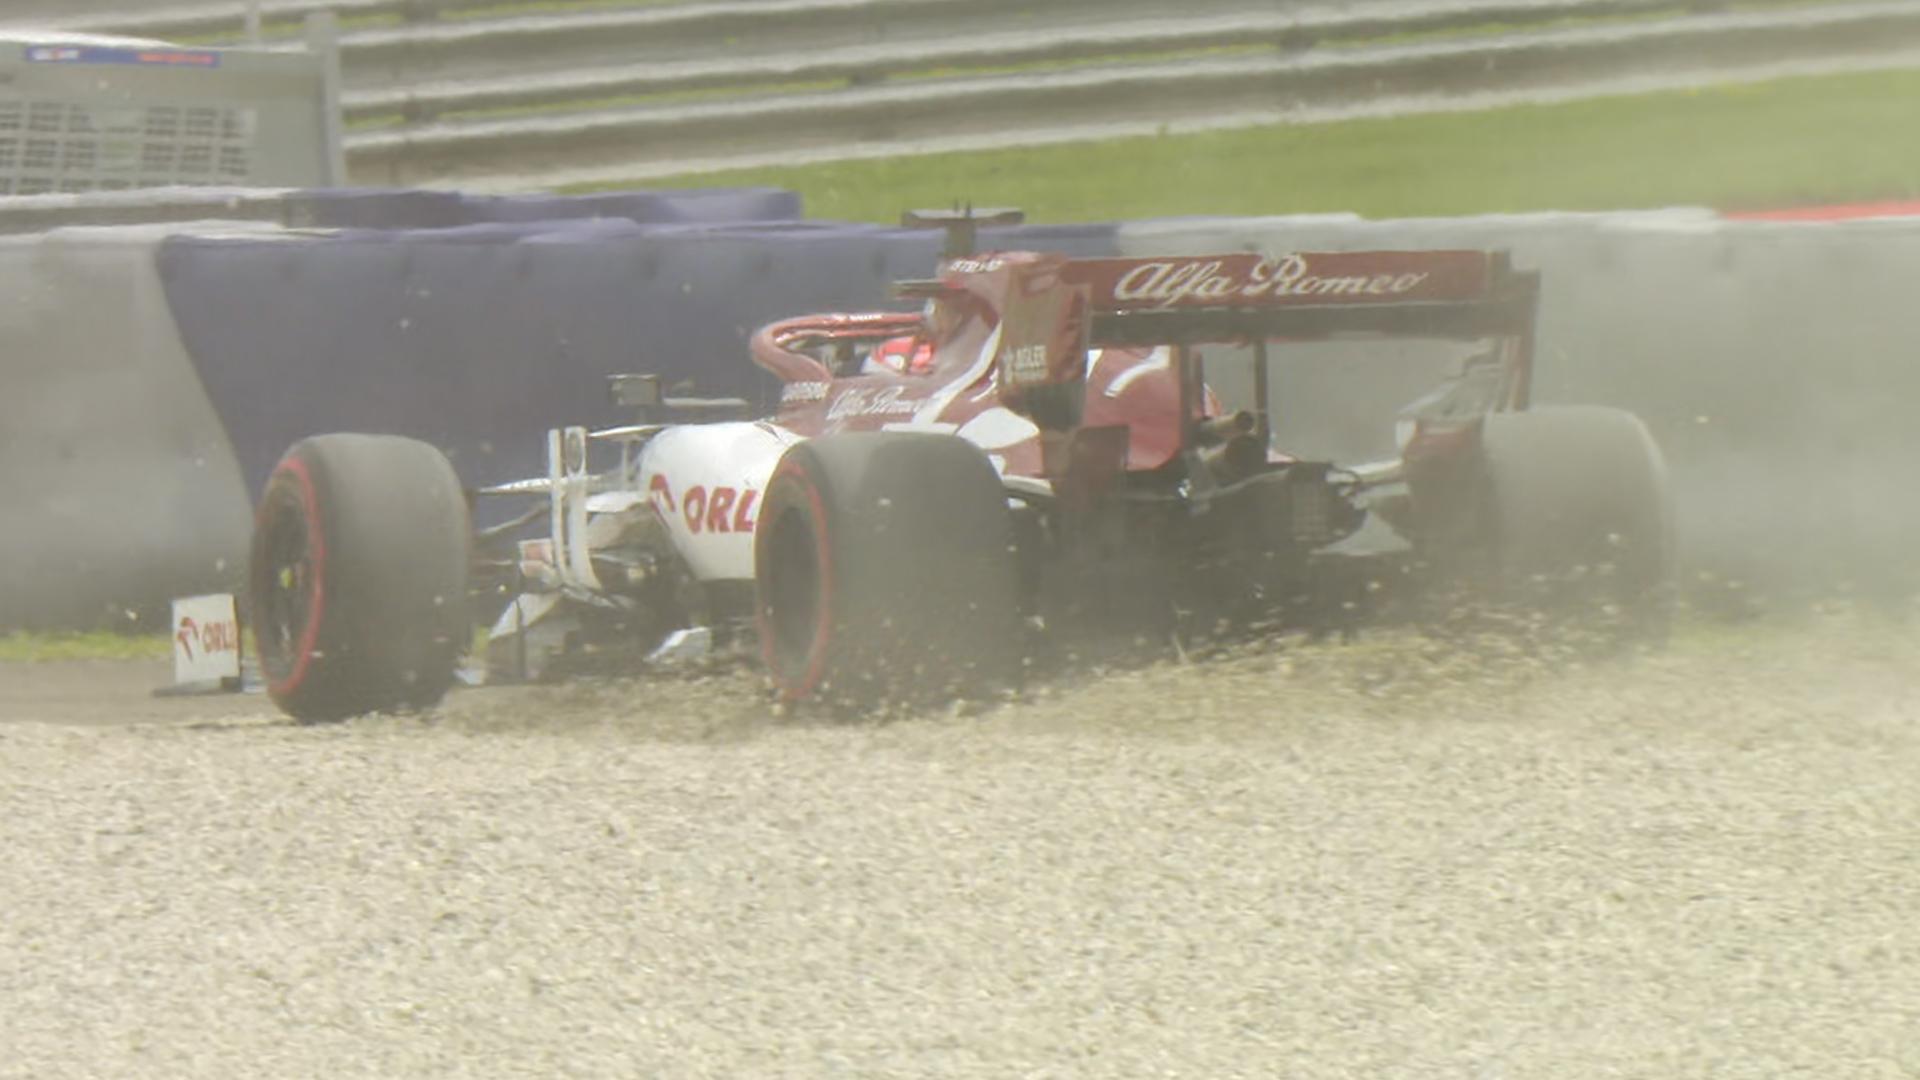 Austria FP2: Raikkonen skids through gravel